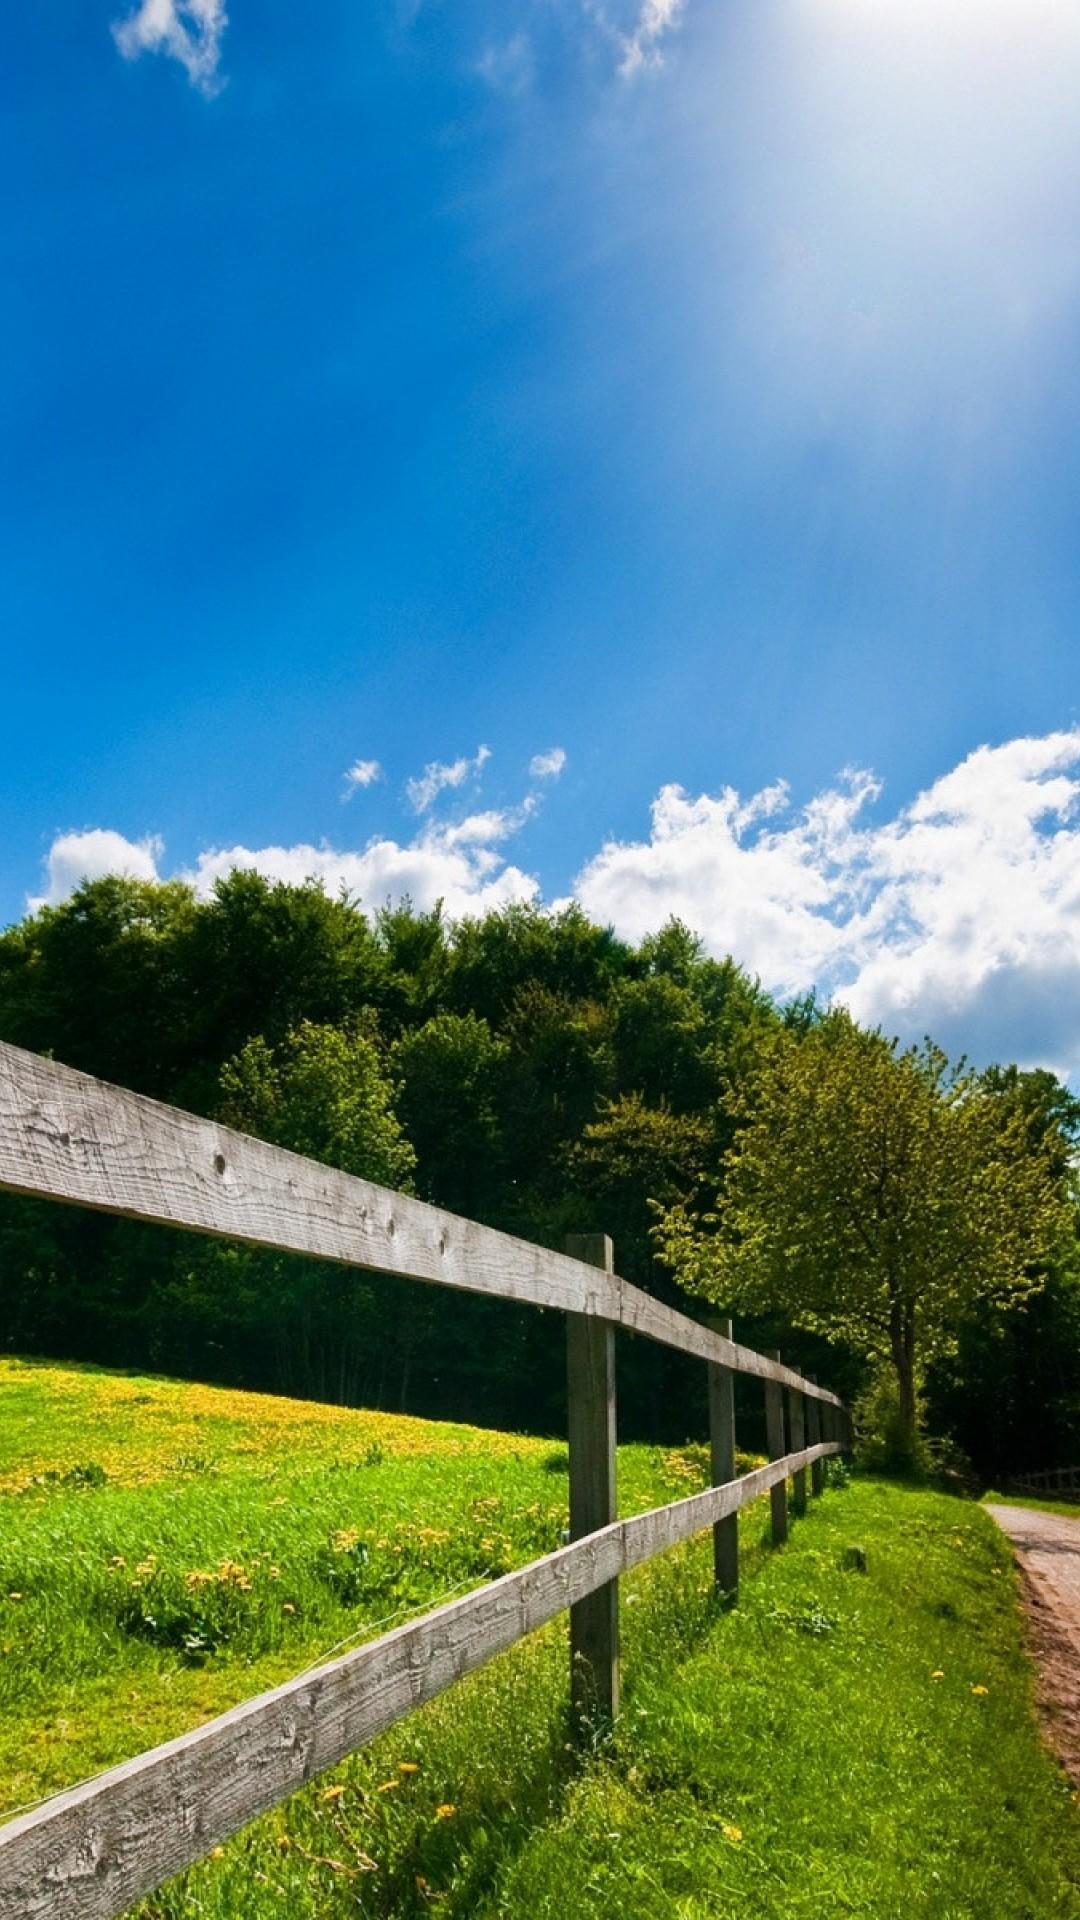 Summer Country Wallpaper : summer, country, wallpaper, Country, Summer, Wallpaper, IPhone, Wallpapers